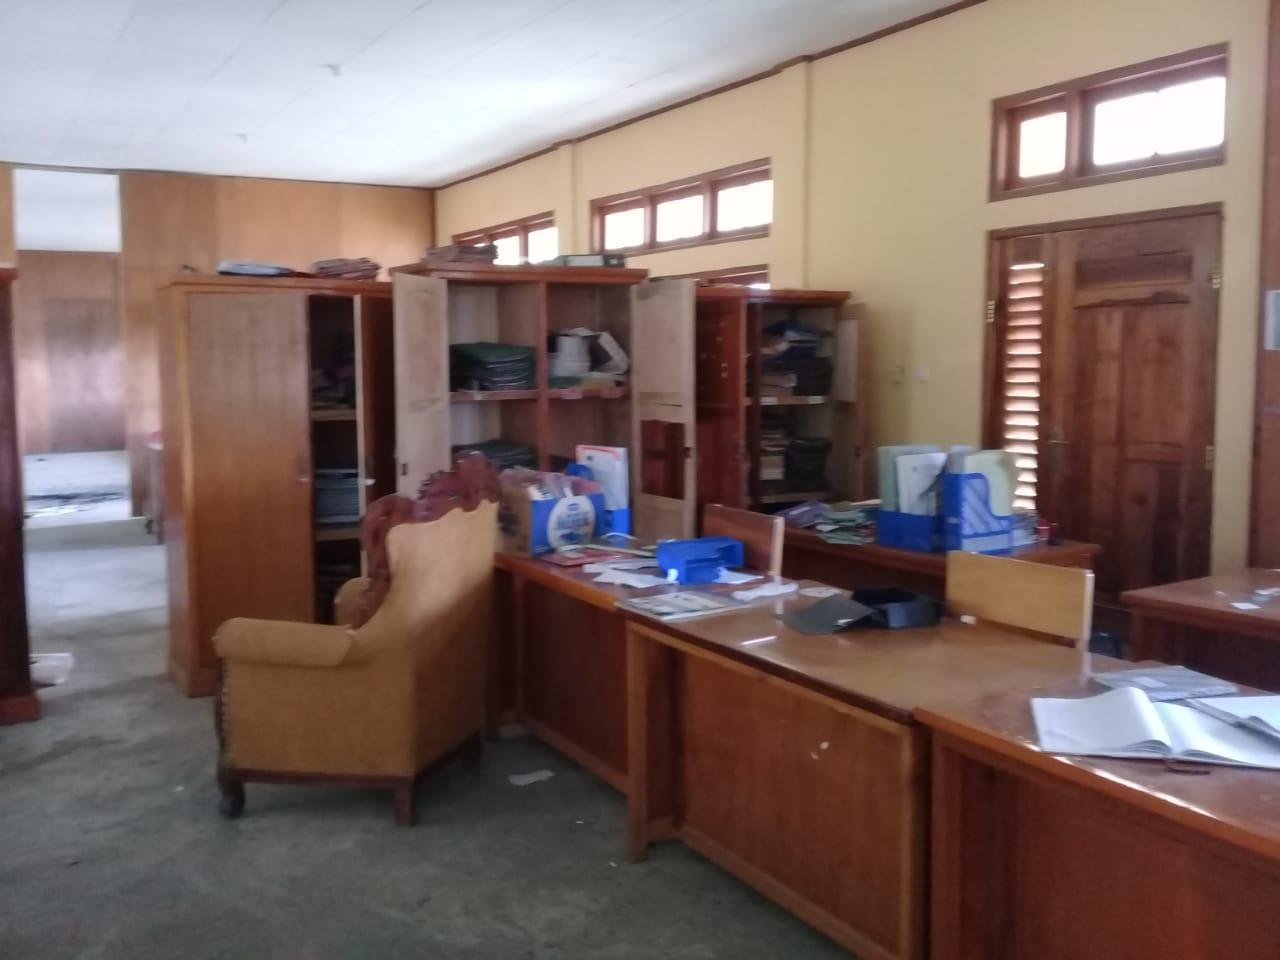 Mahasiswa Undana II Sudah Hengkang, Plt Bupati Ngada Menggerutu